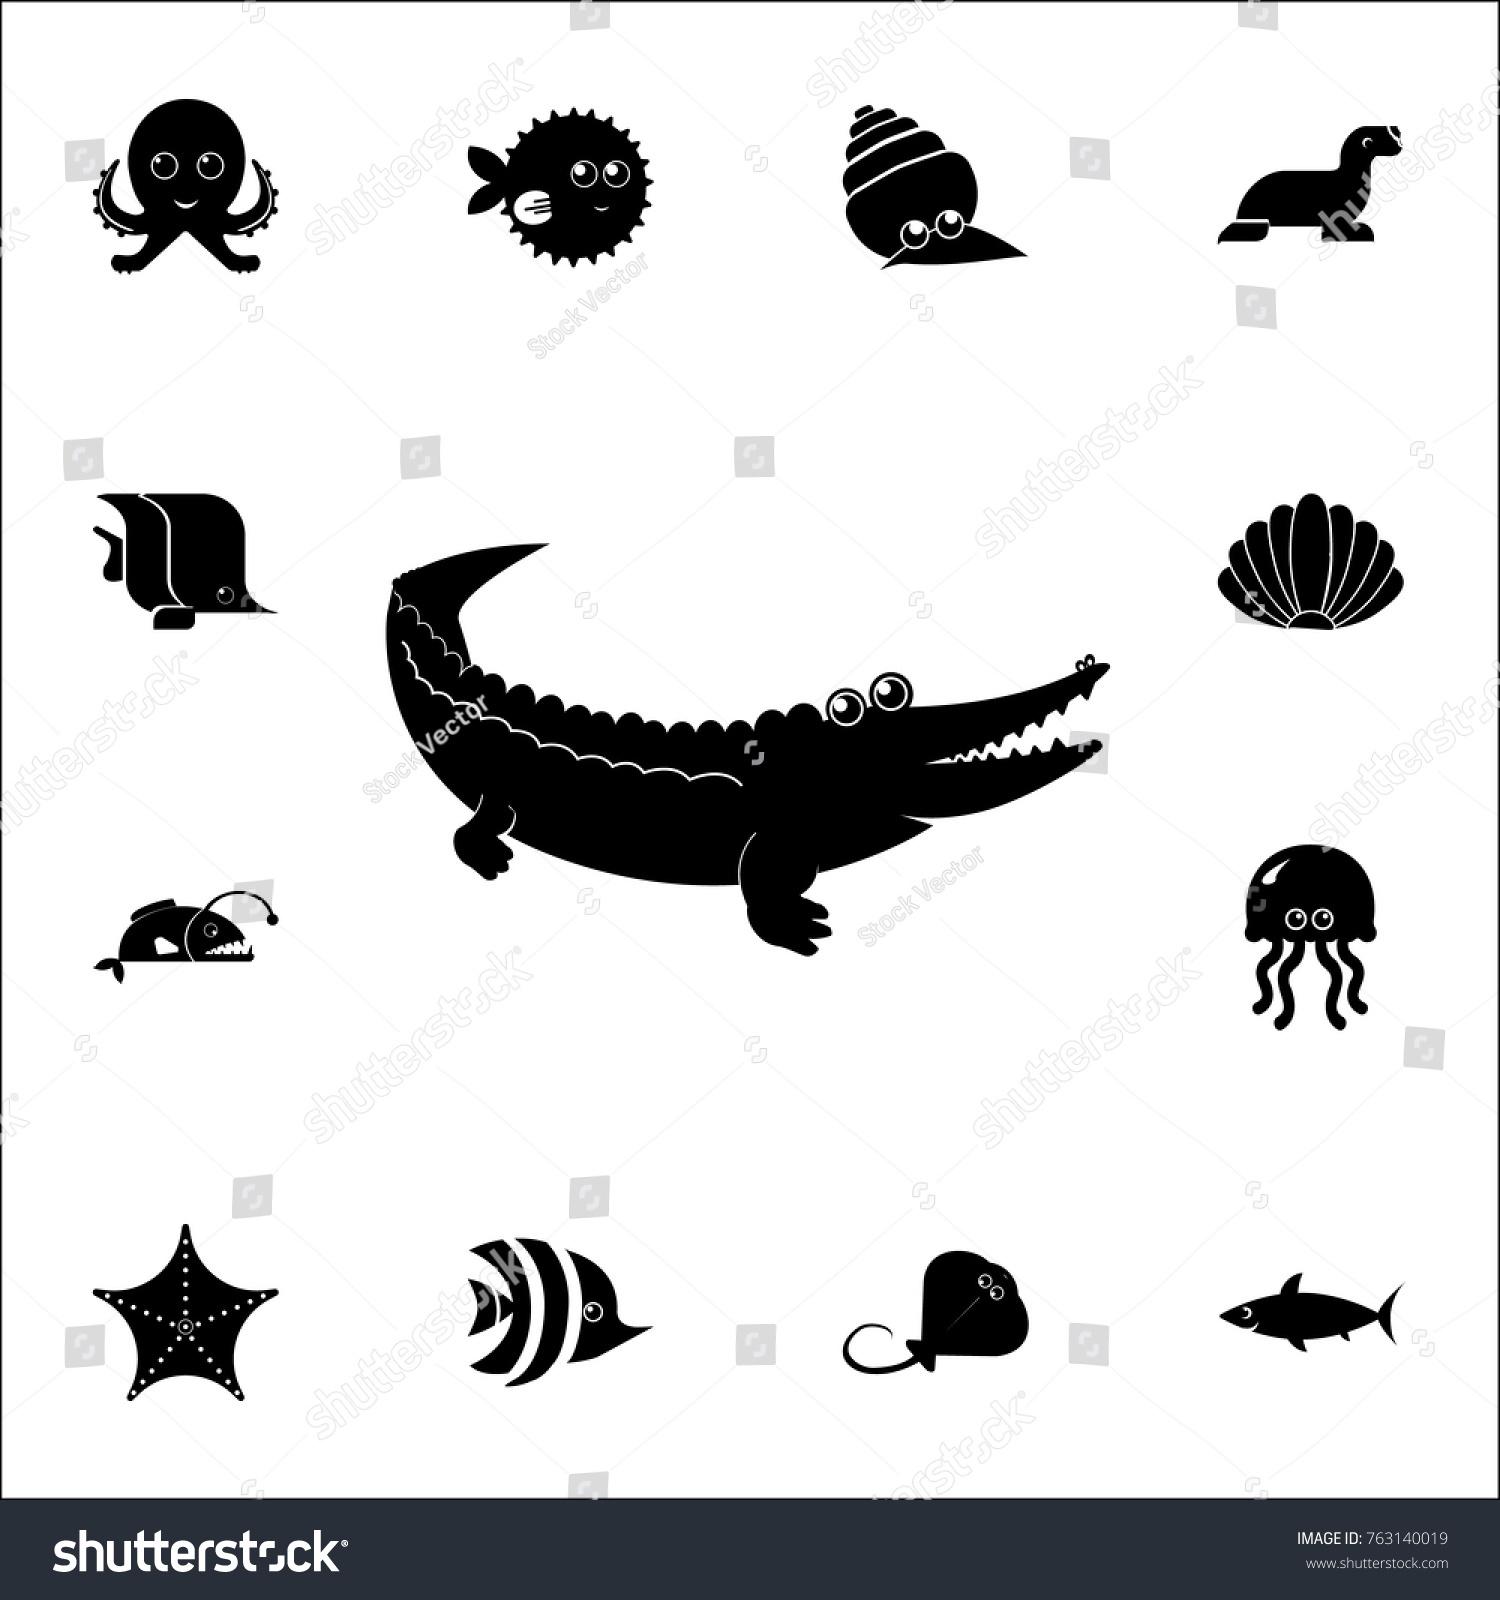 a28a80c632309 crocodile icon. Set of cute aquatic animal icons. Web Icons Premium quality  graphic design. Signs